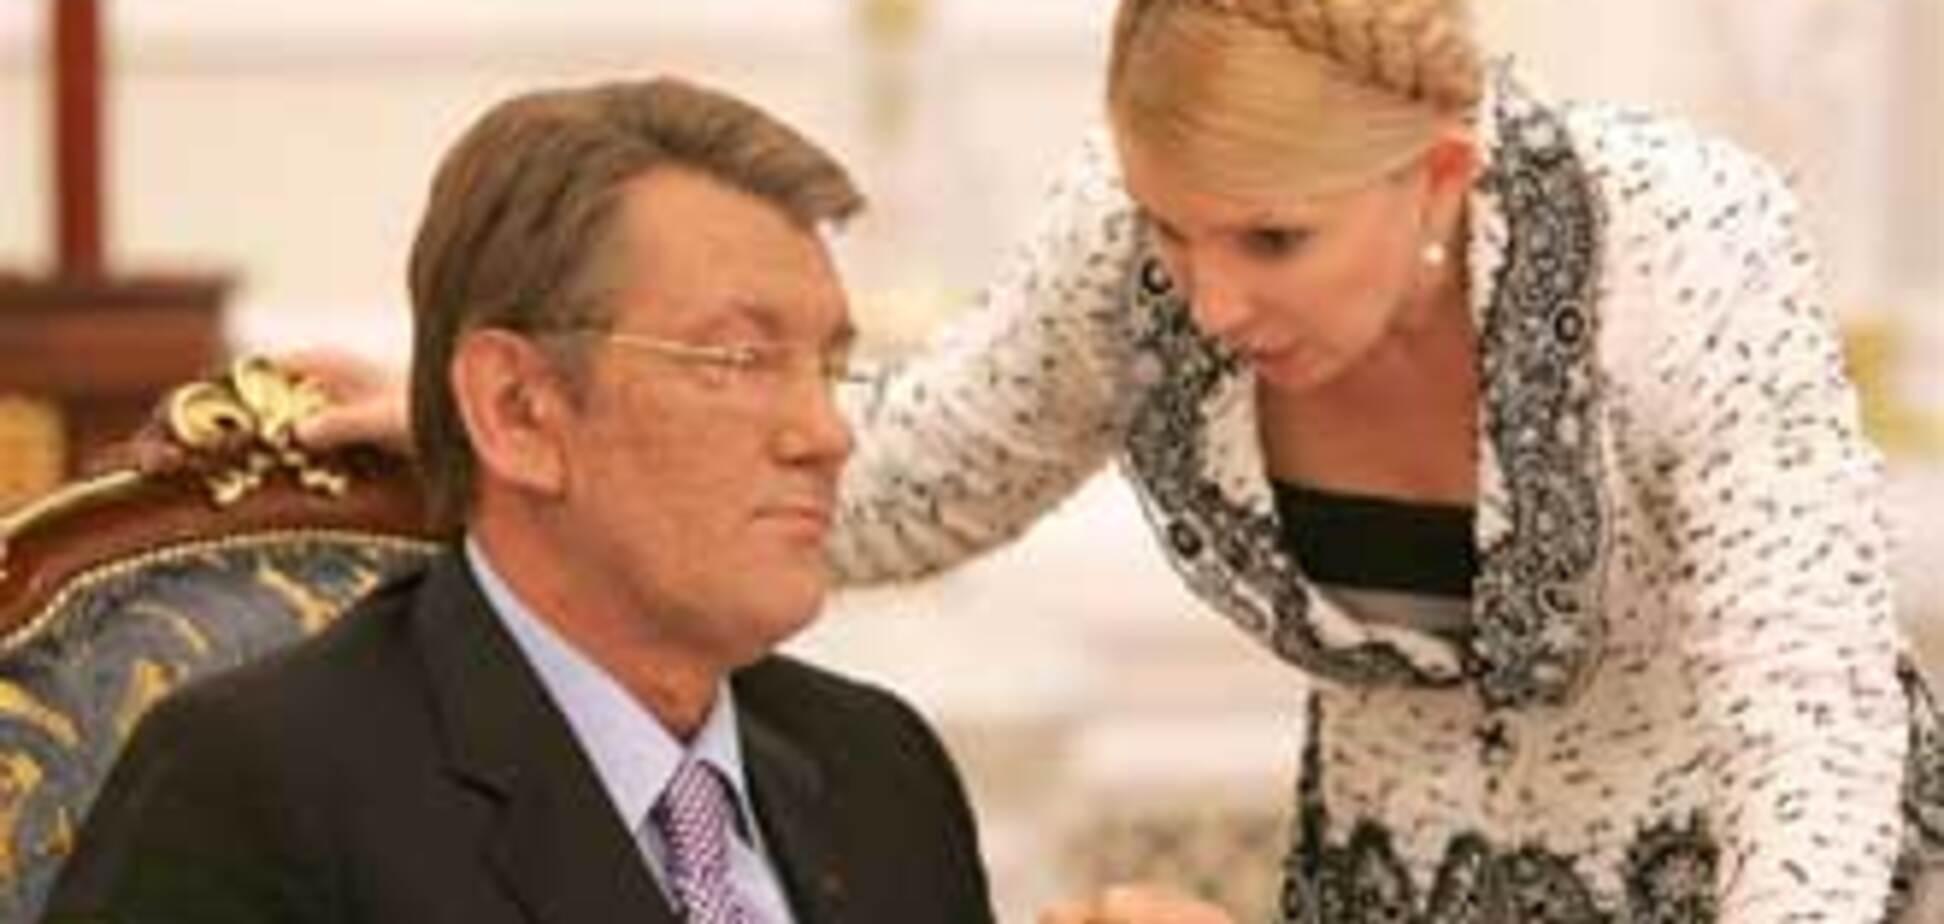 ПР требует 'голову' Луценко за пьянку